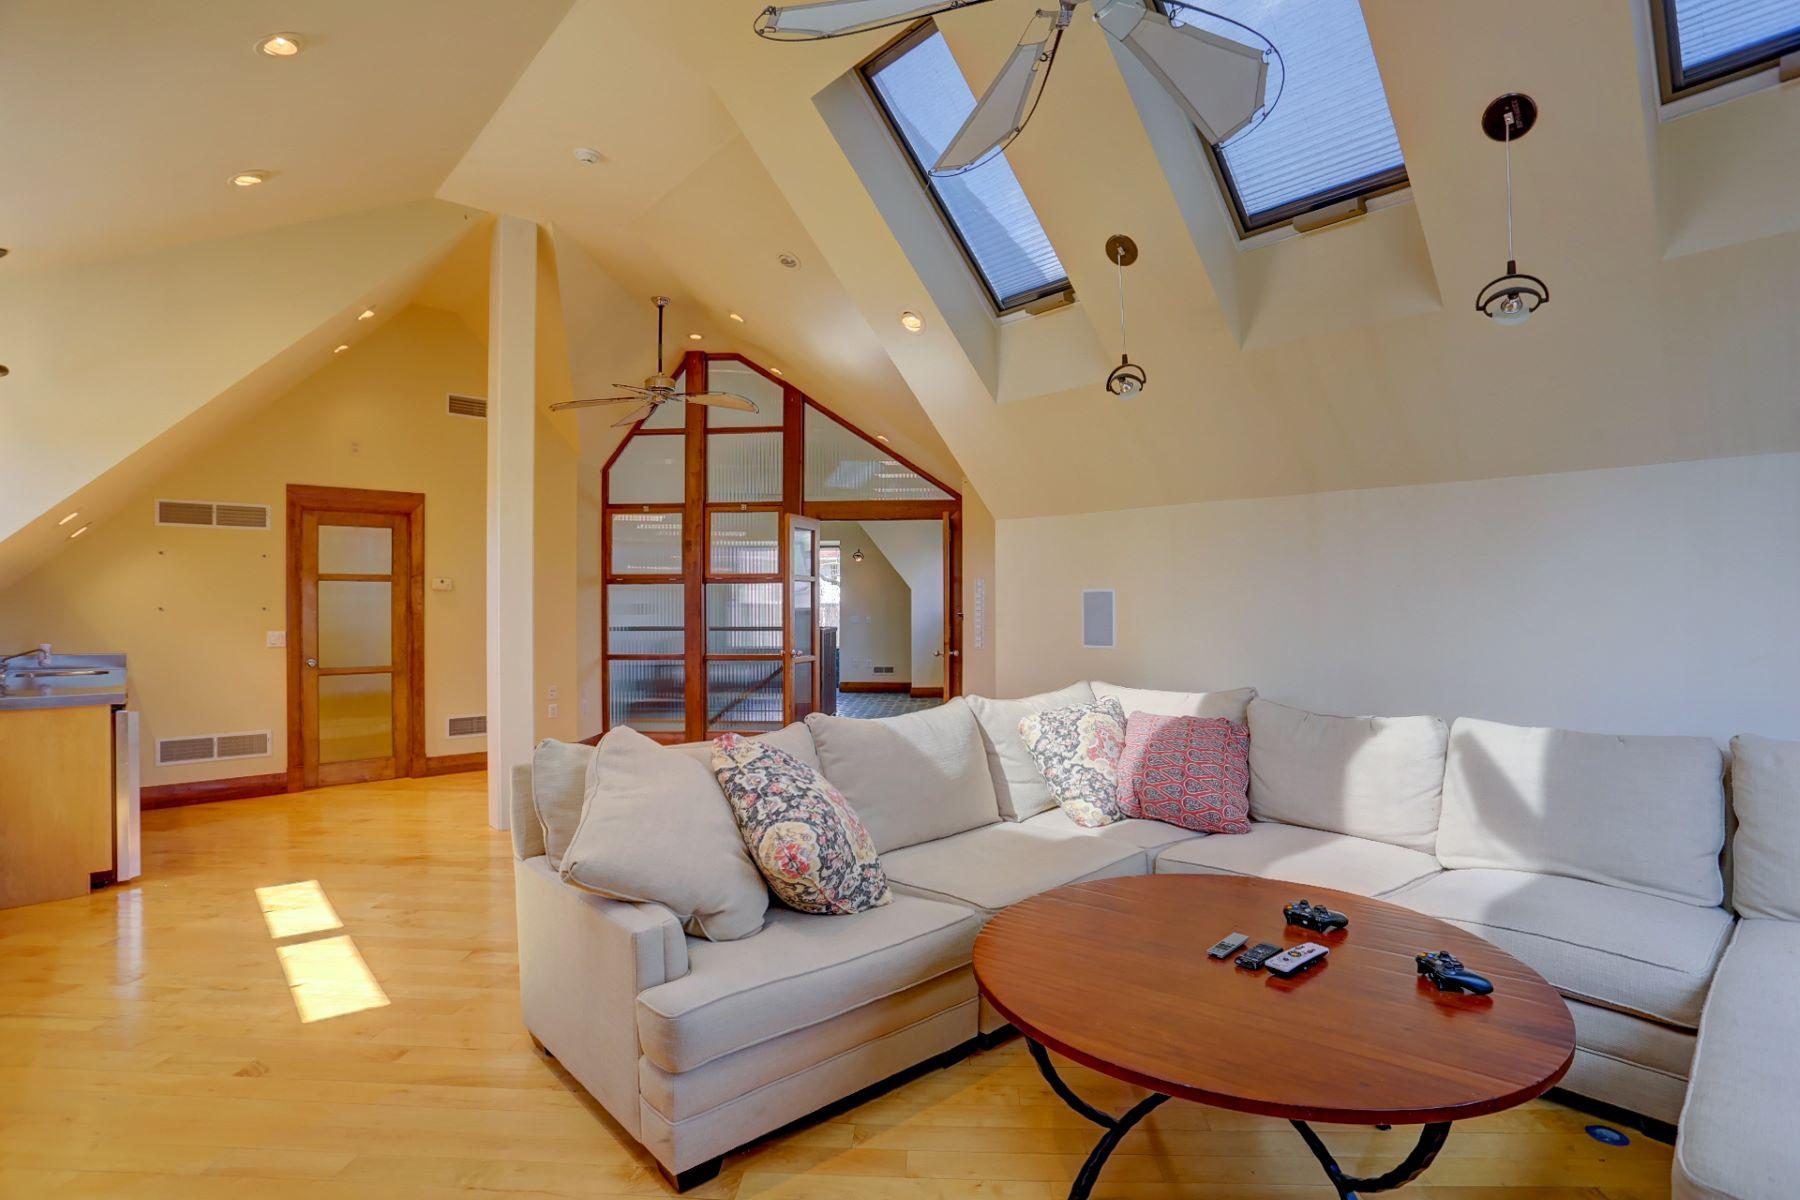 Additional photo for property listing at 1056 Wheatland Avenue  兰开斯特, 宾夕法尼亚州 17603 美国